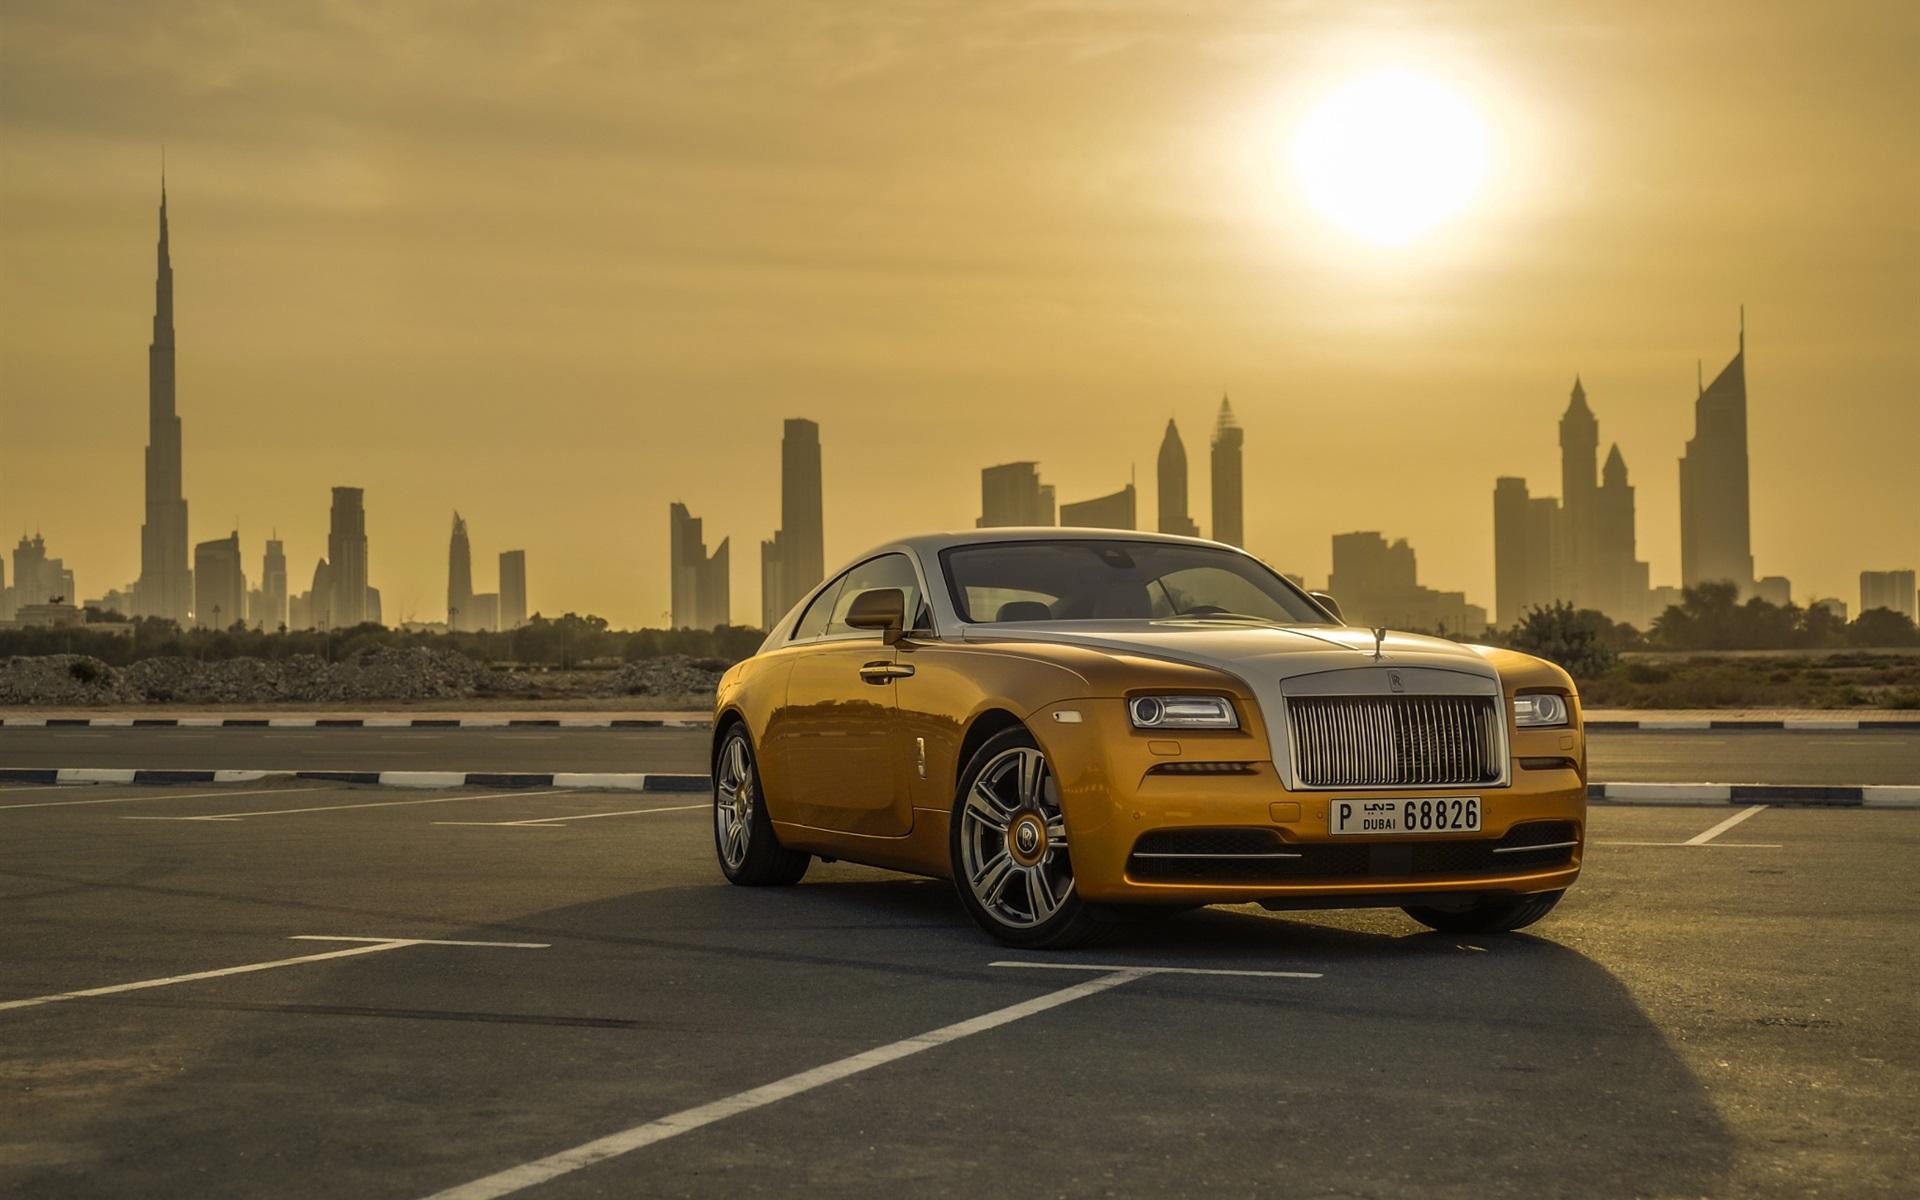 Wallpaper Gold Color Rolls Royce Luxury Car Dubai Sunset